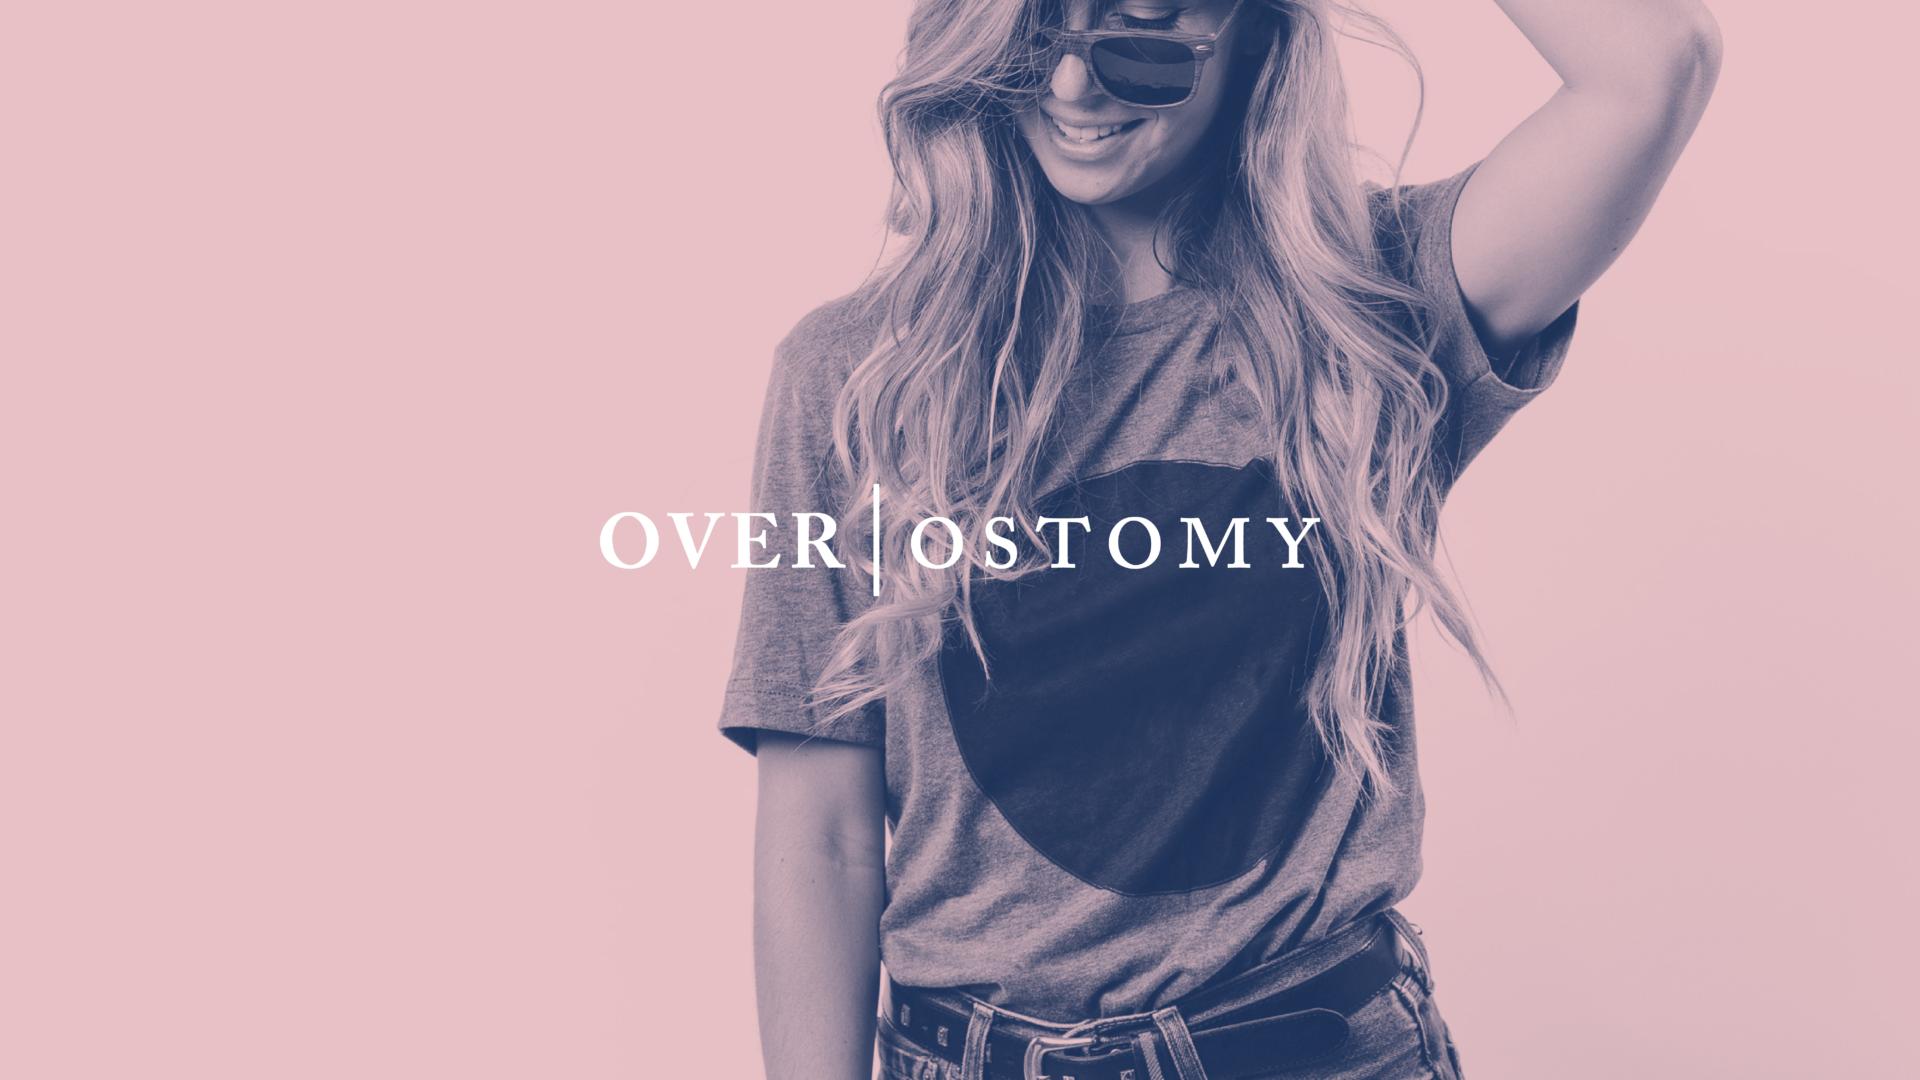 Over Ostomy - Branding   The Underground Design Studio